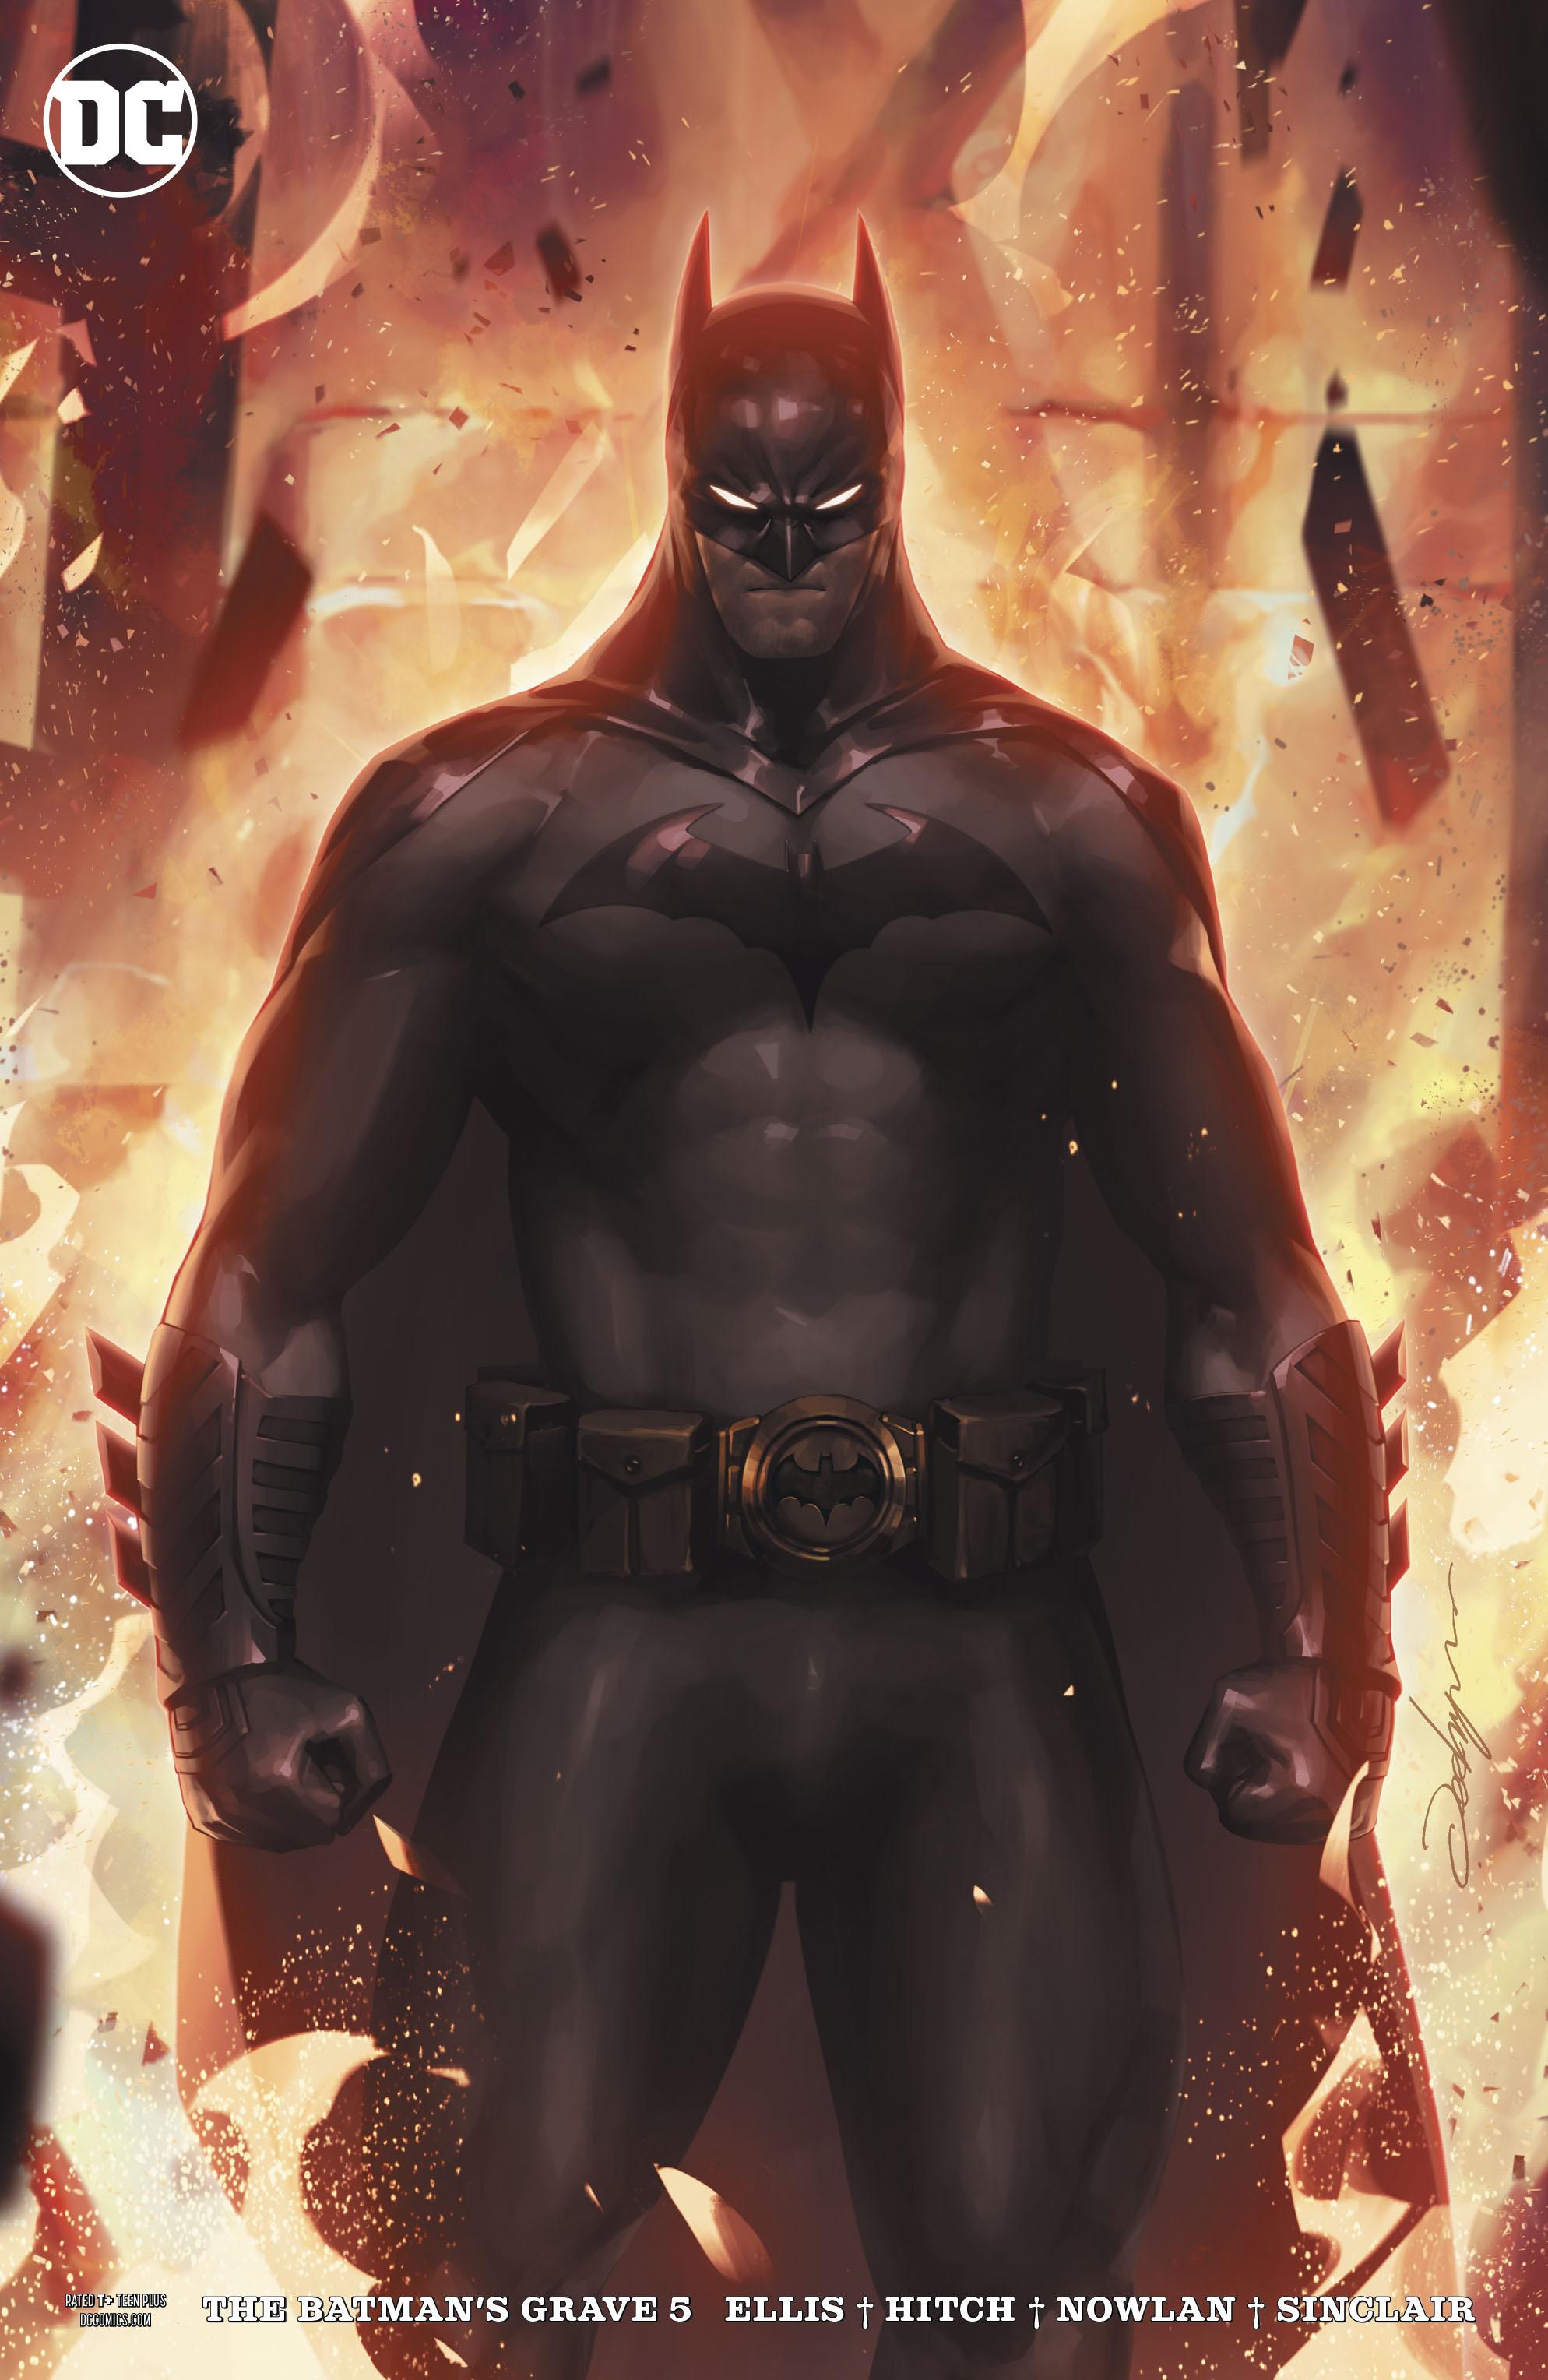 The Batman's Grave Vol 1 5 Variant.jpg